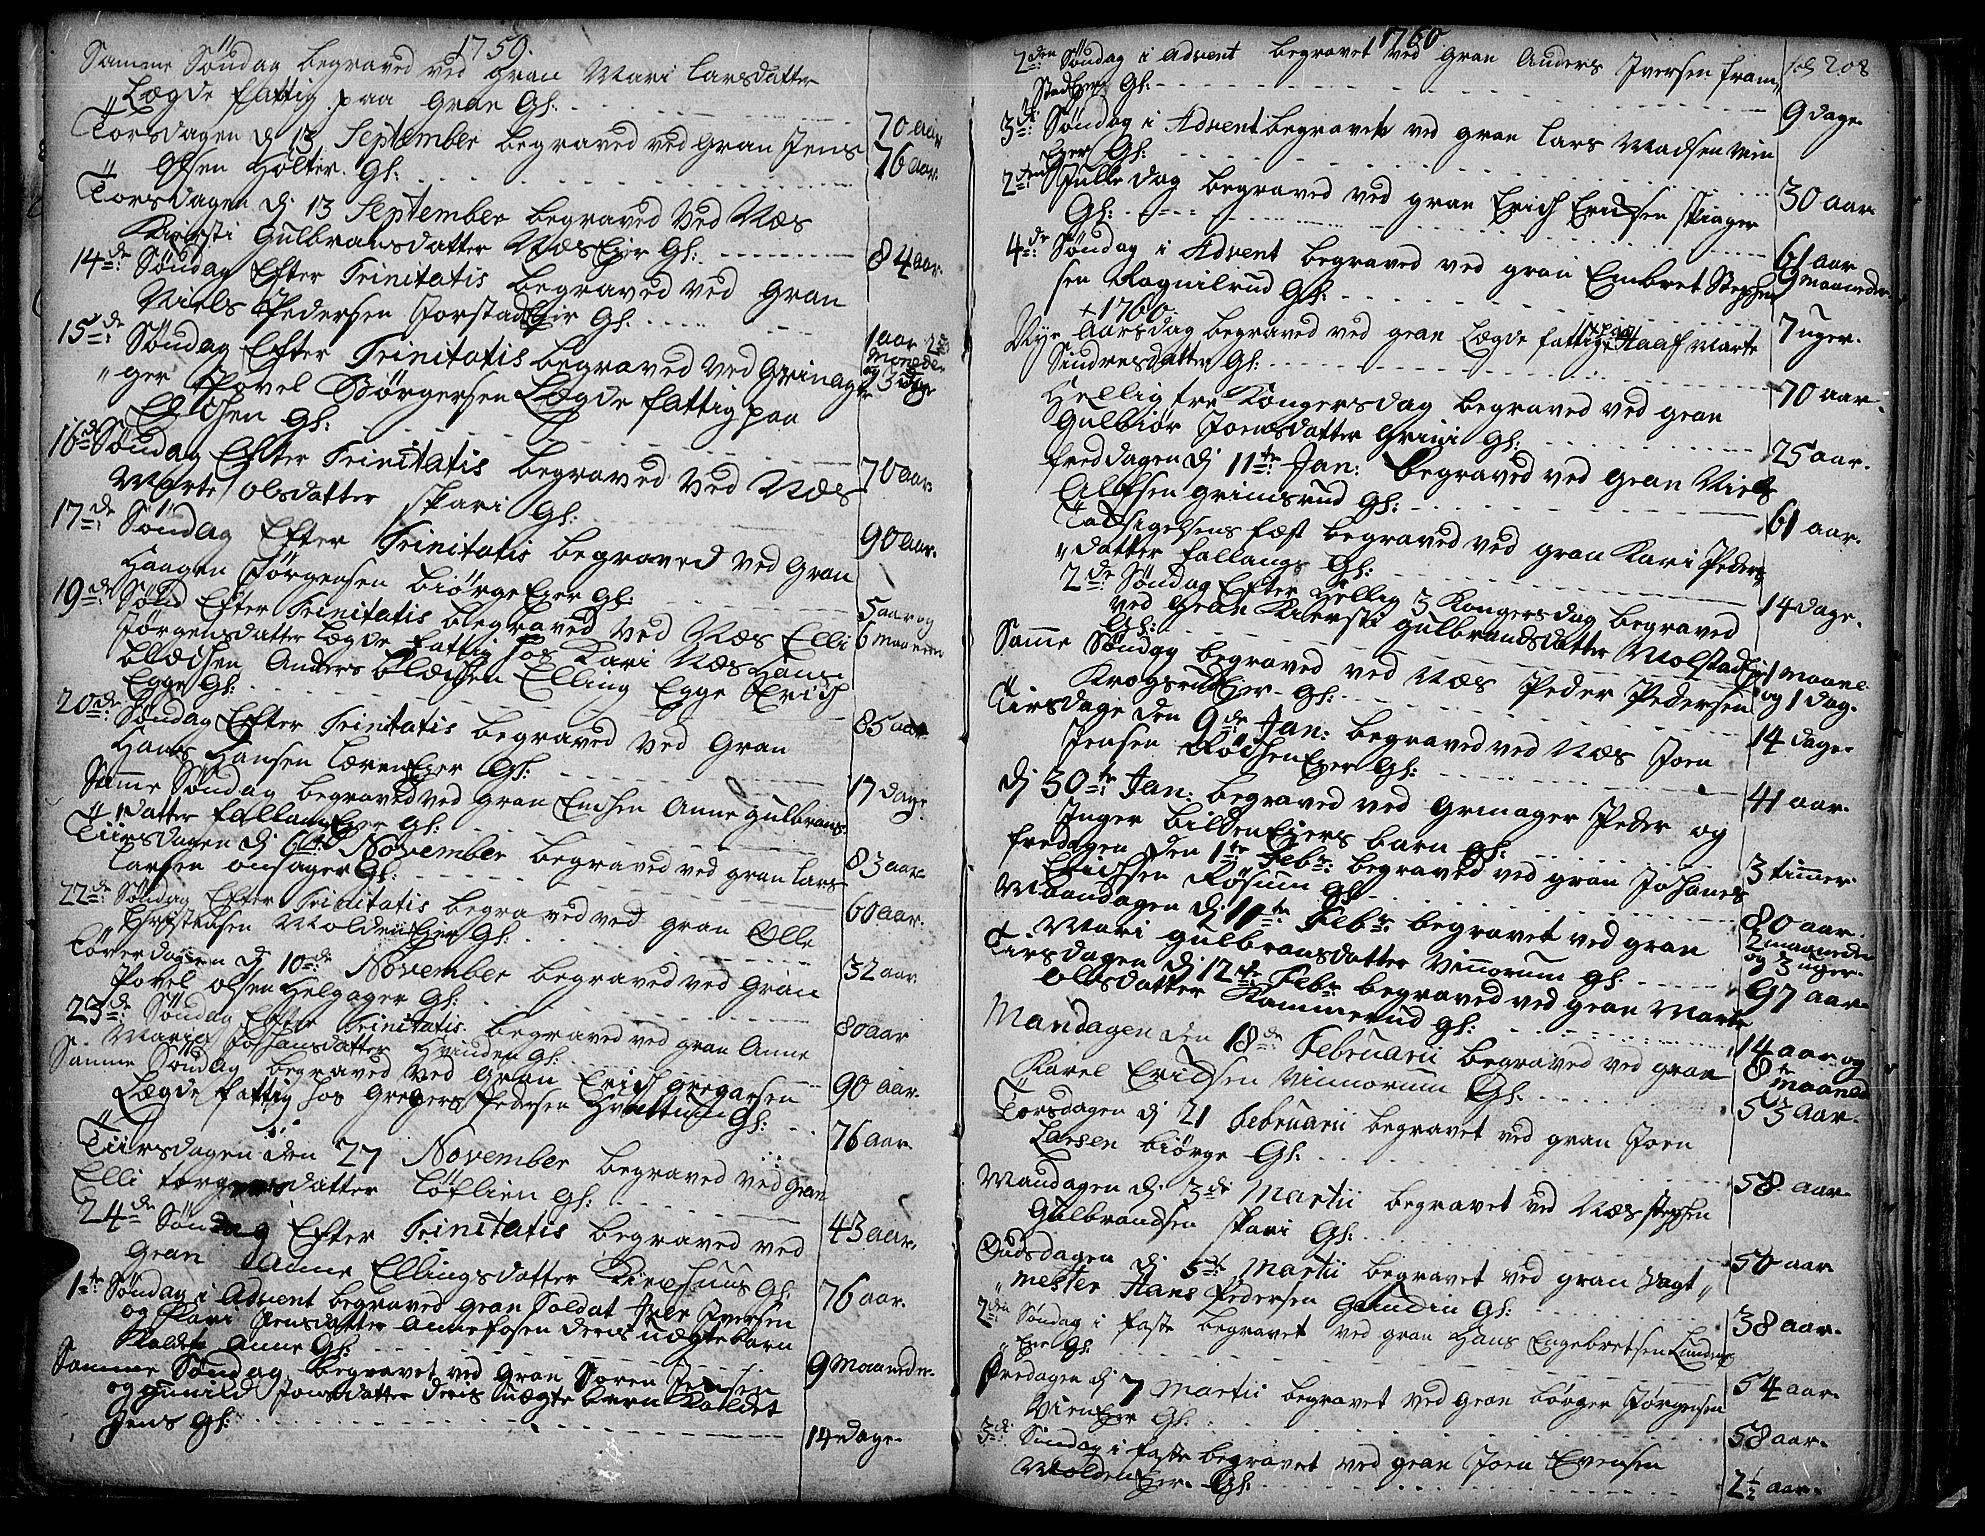 SAH, Gran prestekontor, Ministerialbok nr. 4, 1759-1775, s. 208